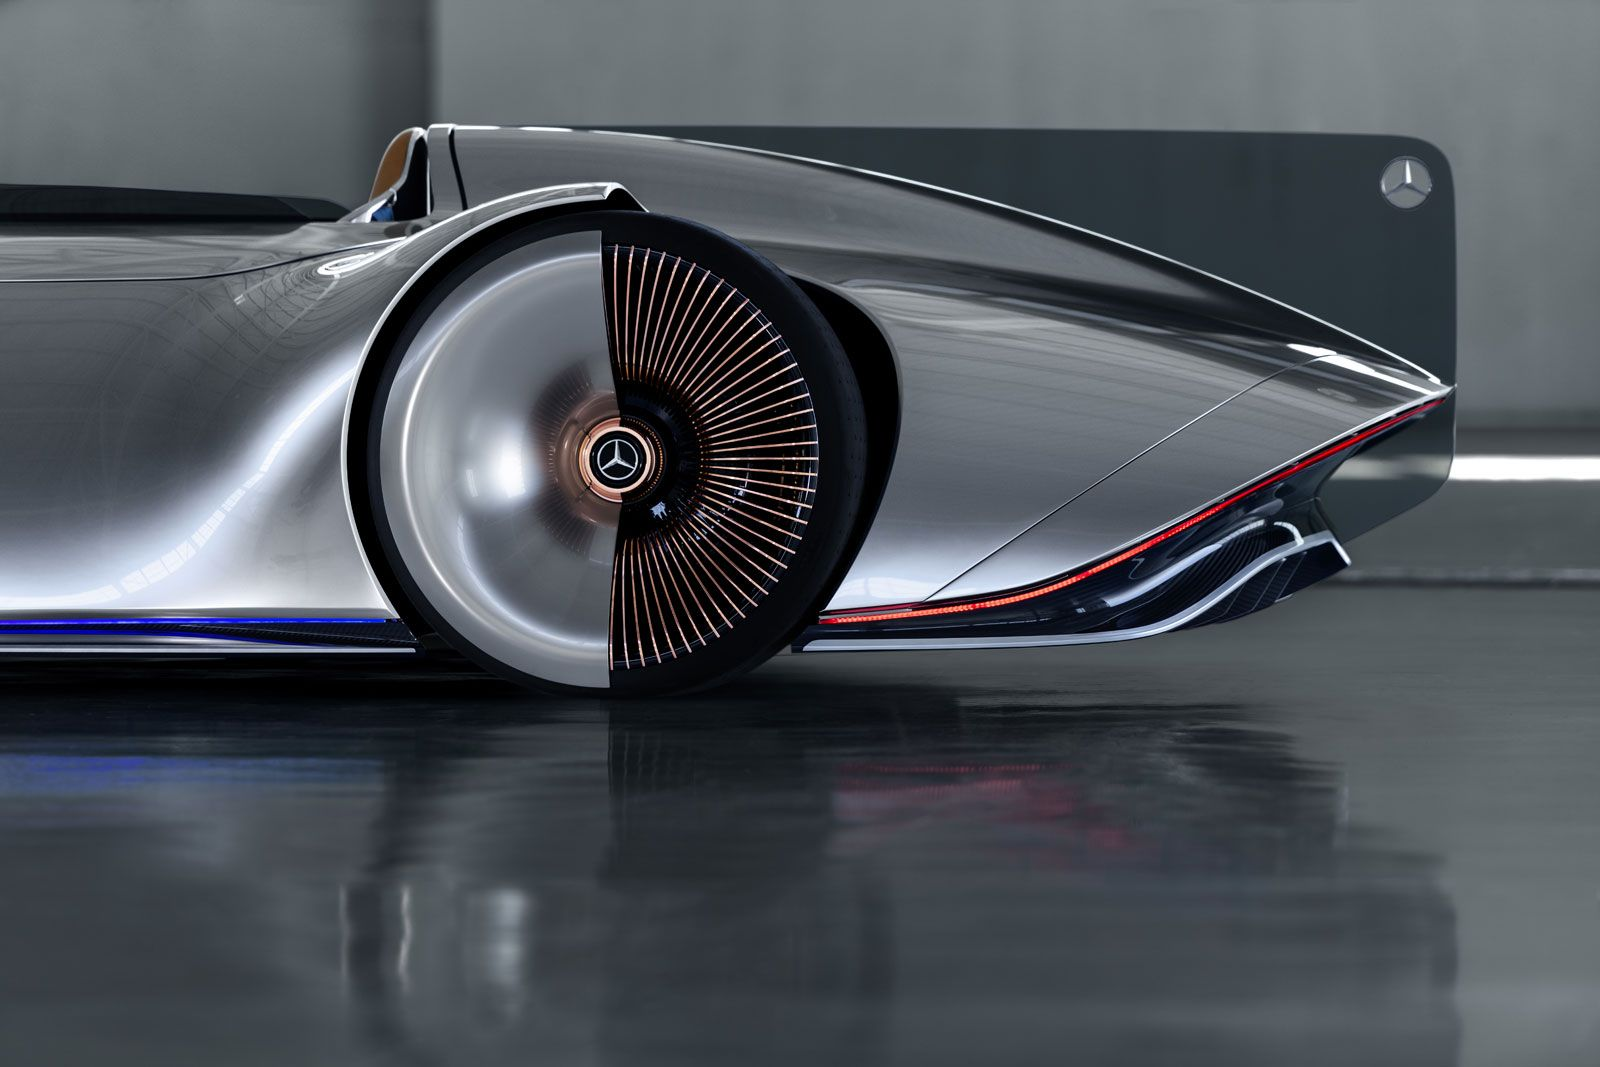 Mercedes Benz Vision Eq Silver Arrow Concept Electric Car Design Car Design Mercedes Benz